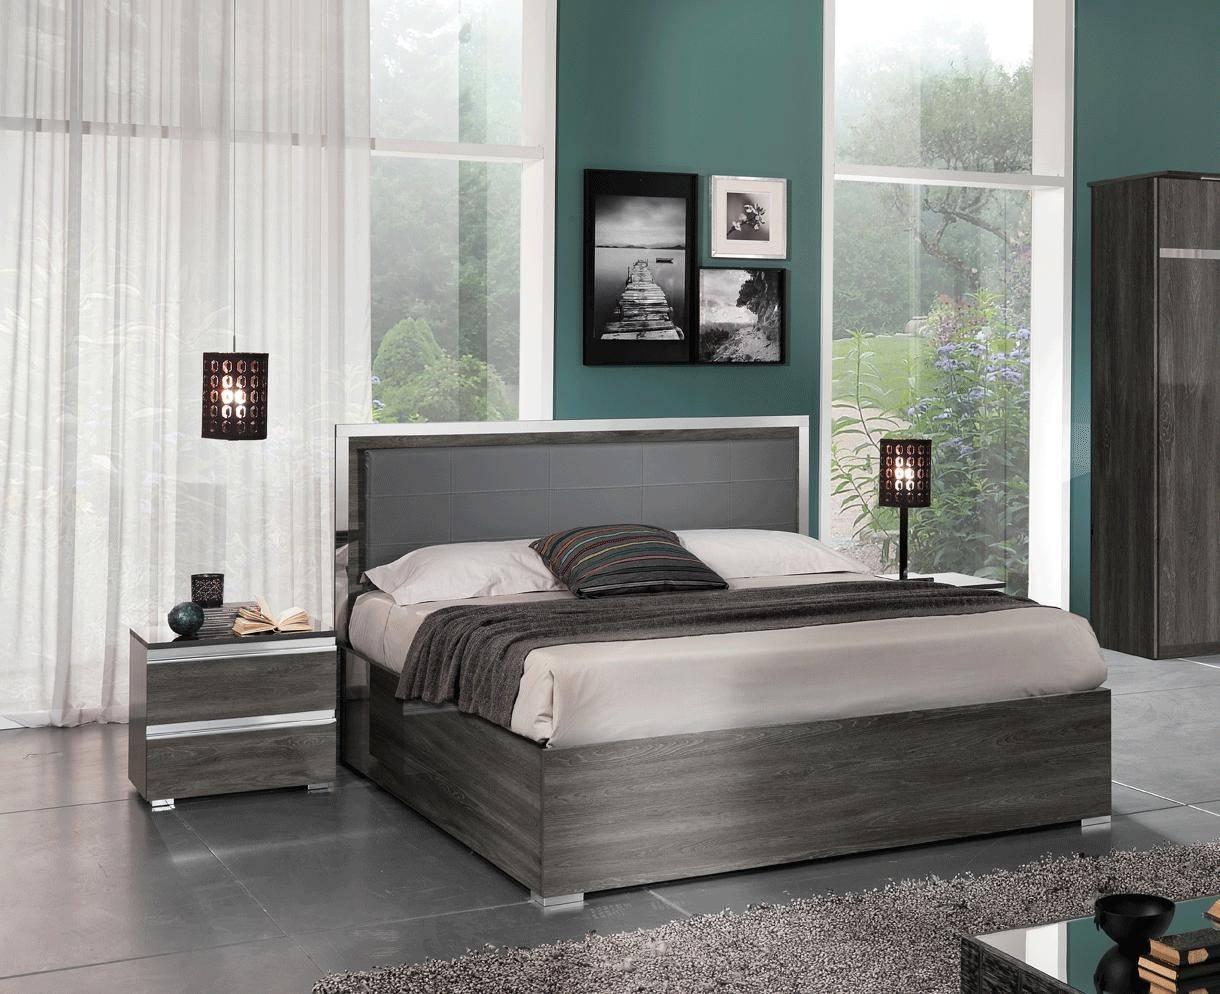 ESF Oxford Queen Platform Bedroom Set 3 Pcs in Gray, Wash Oak, Eco-Leather